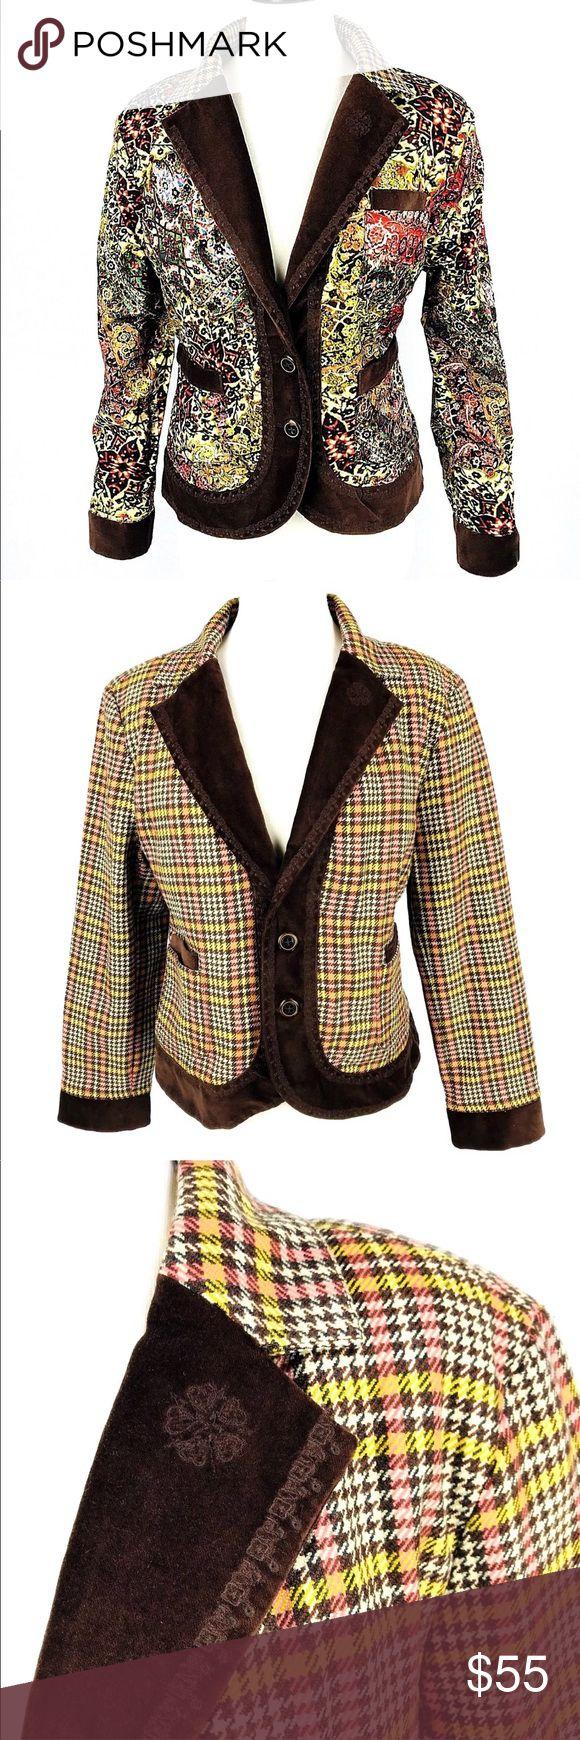 "Reversible Robert Graham Blazer Floral Plaid Reversible blazer by Robert Graham. Plaid houndstooth is wool, floral is viscose.  Measurements: Shoulder to shoulder- 17"" Chest- 44"" Length- 23"" Sleeve- 23"" I-25 Robert Graham Jackets & Coats Blazers"